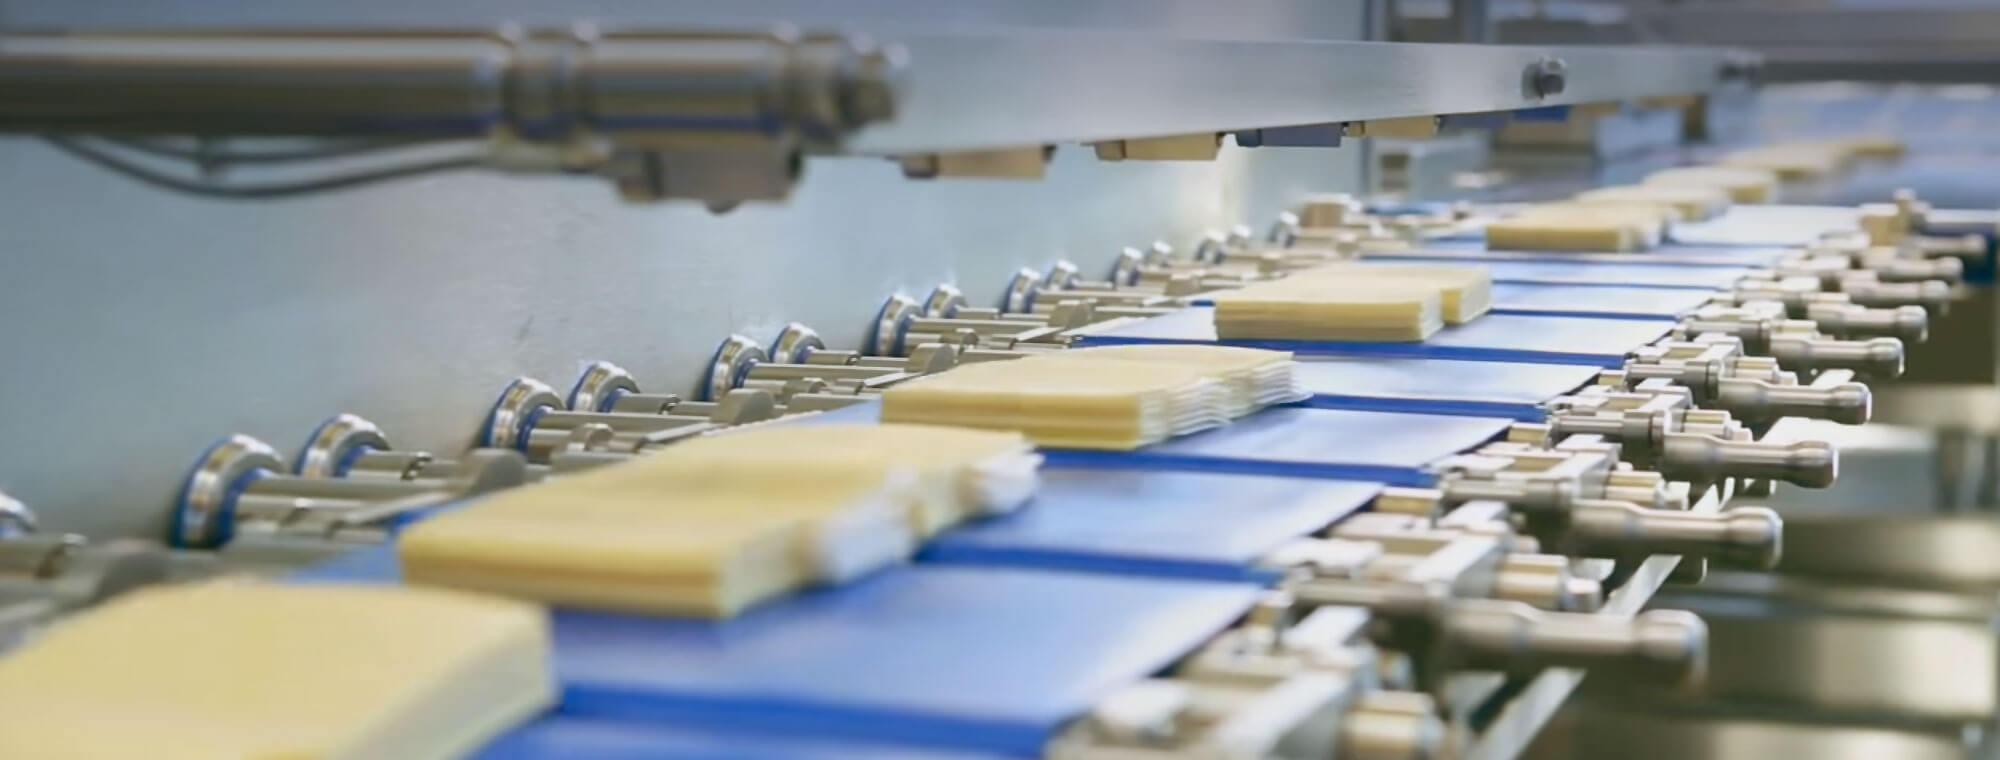 Moret packagin interleaving queso